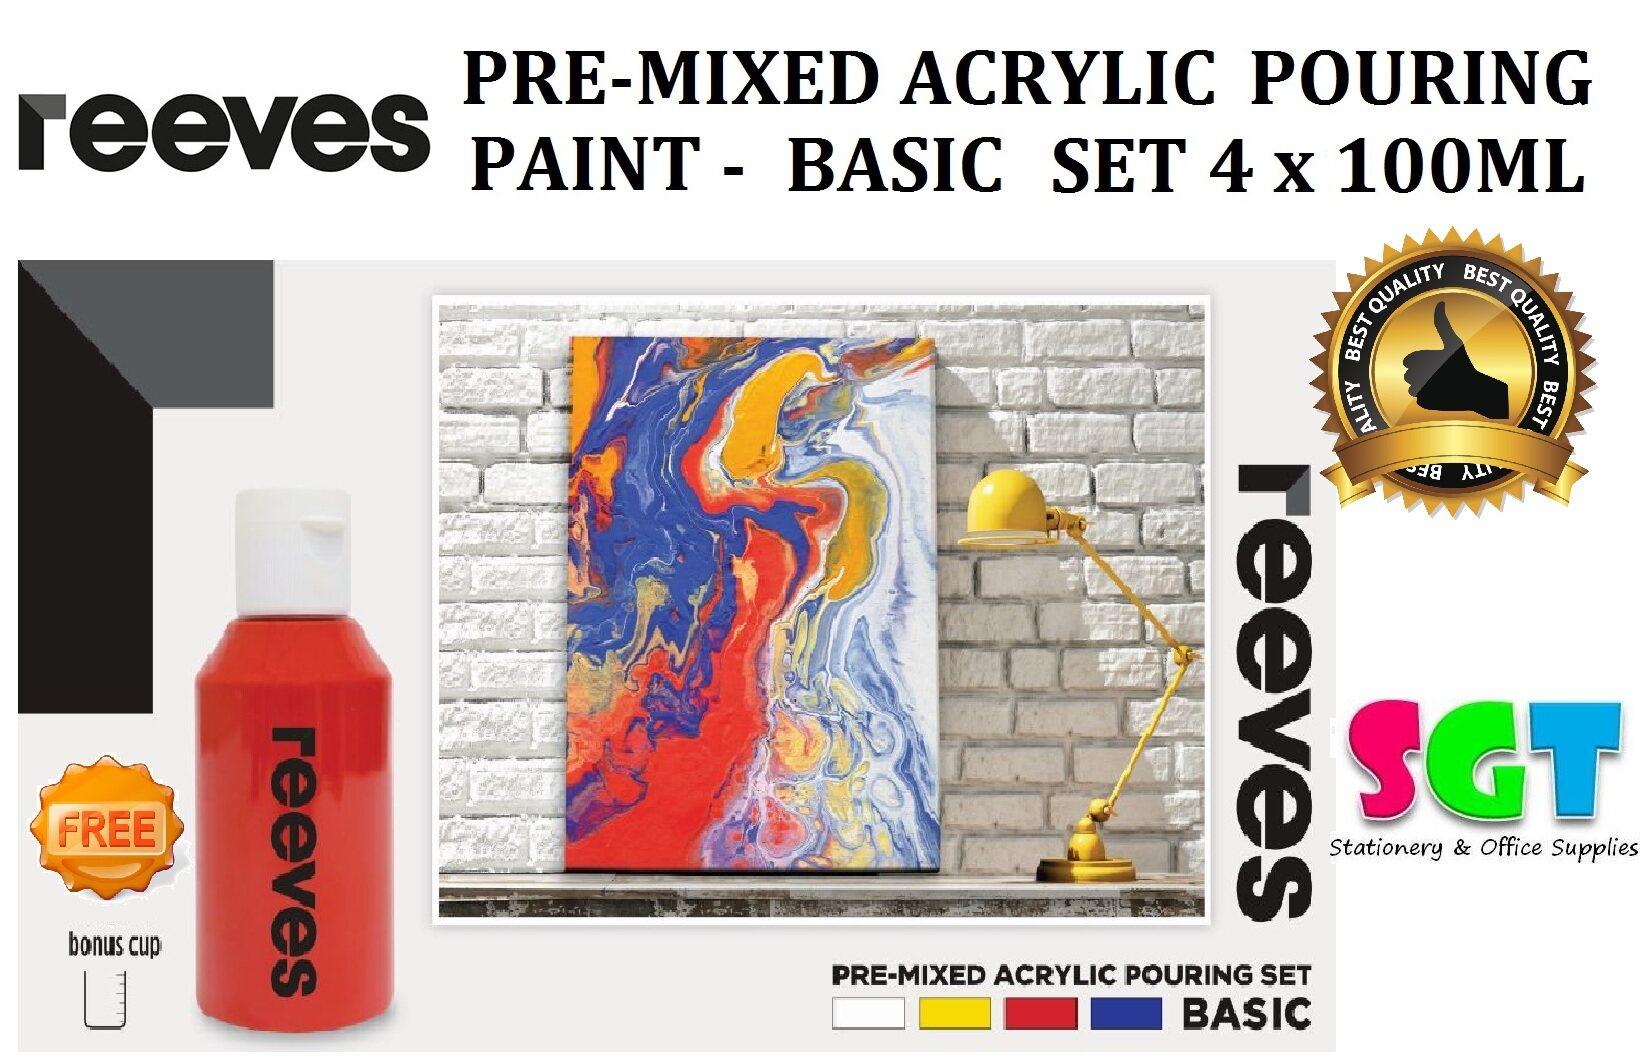 REEVES Pre-Mixed Acrylic Pour Paint Sets ( Set 4 x 100ml ) Basic Set